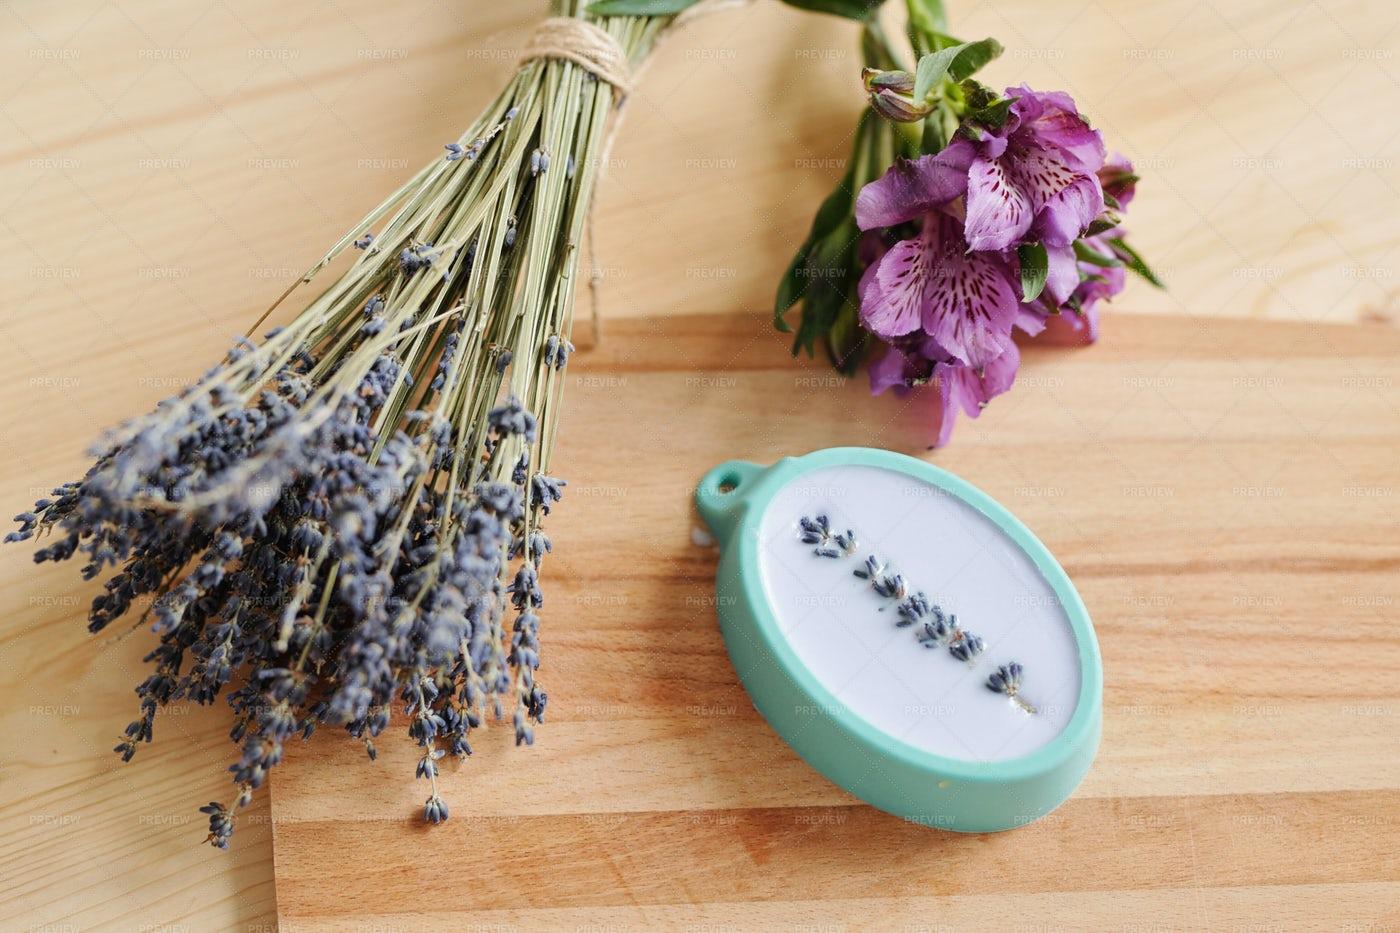 Fresh Lavender And Purple...: Stock Photos